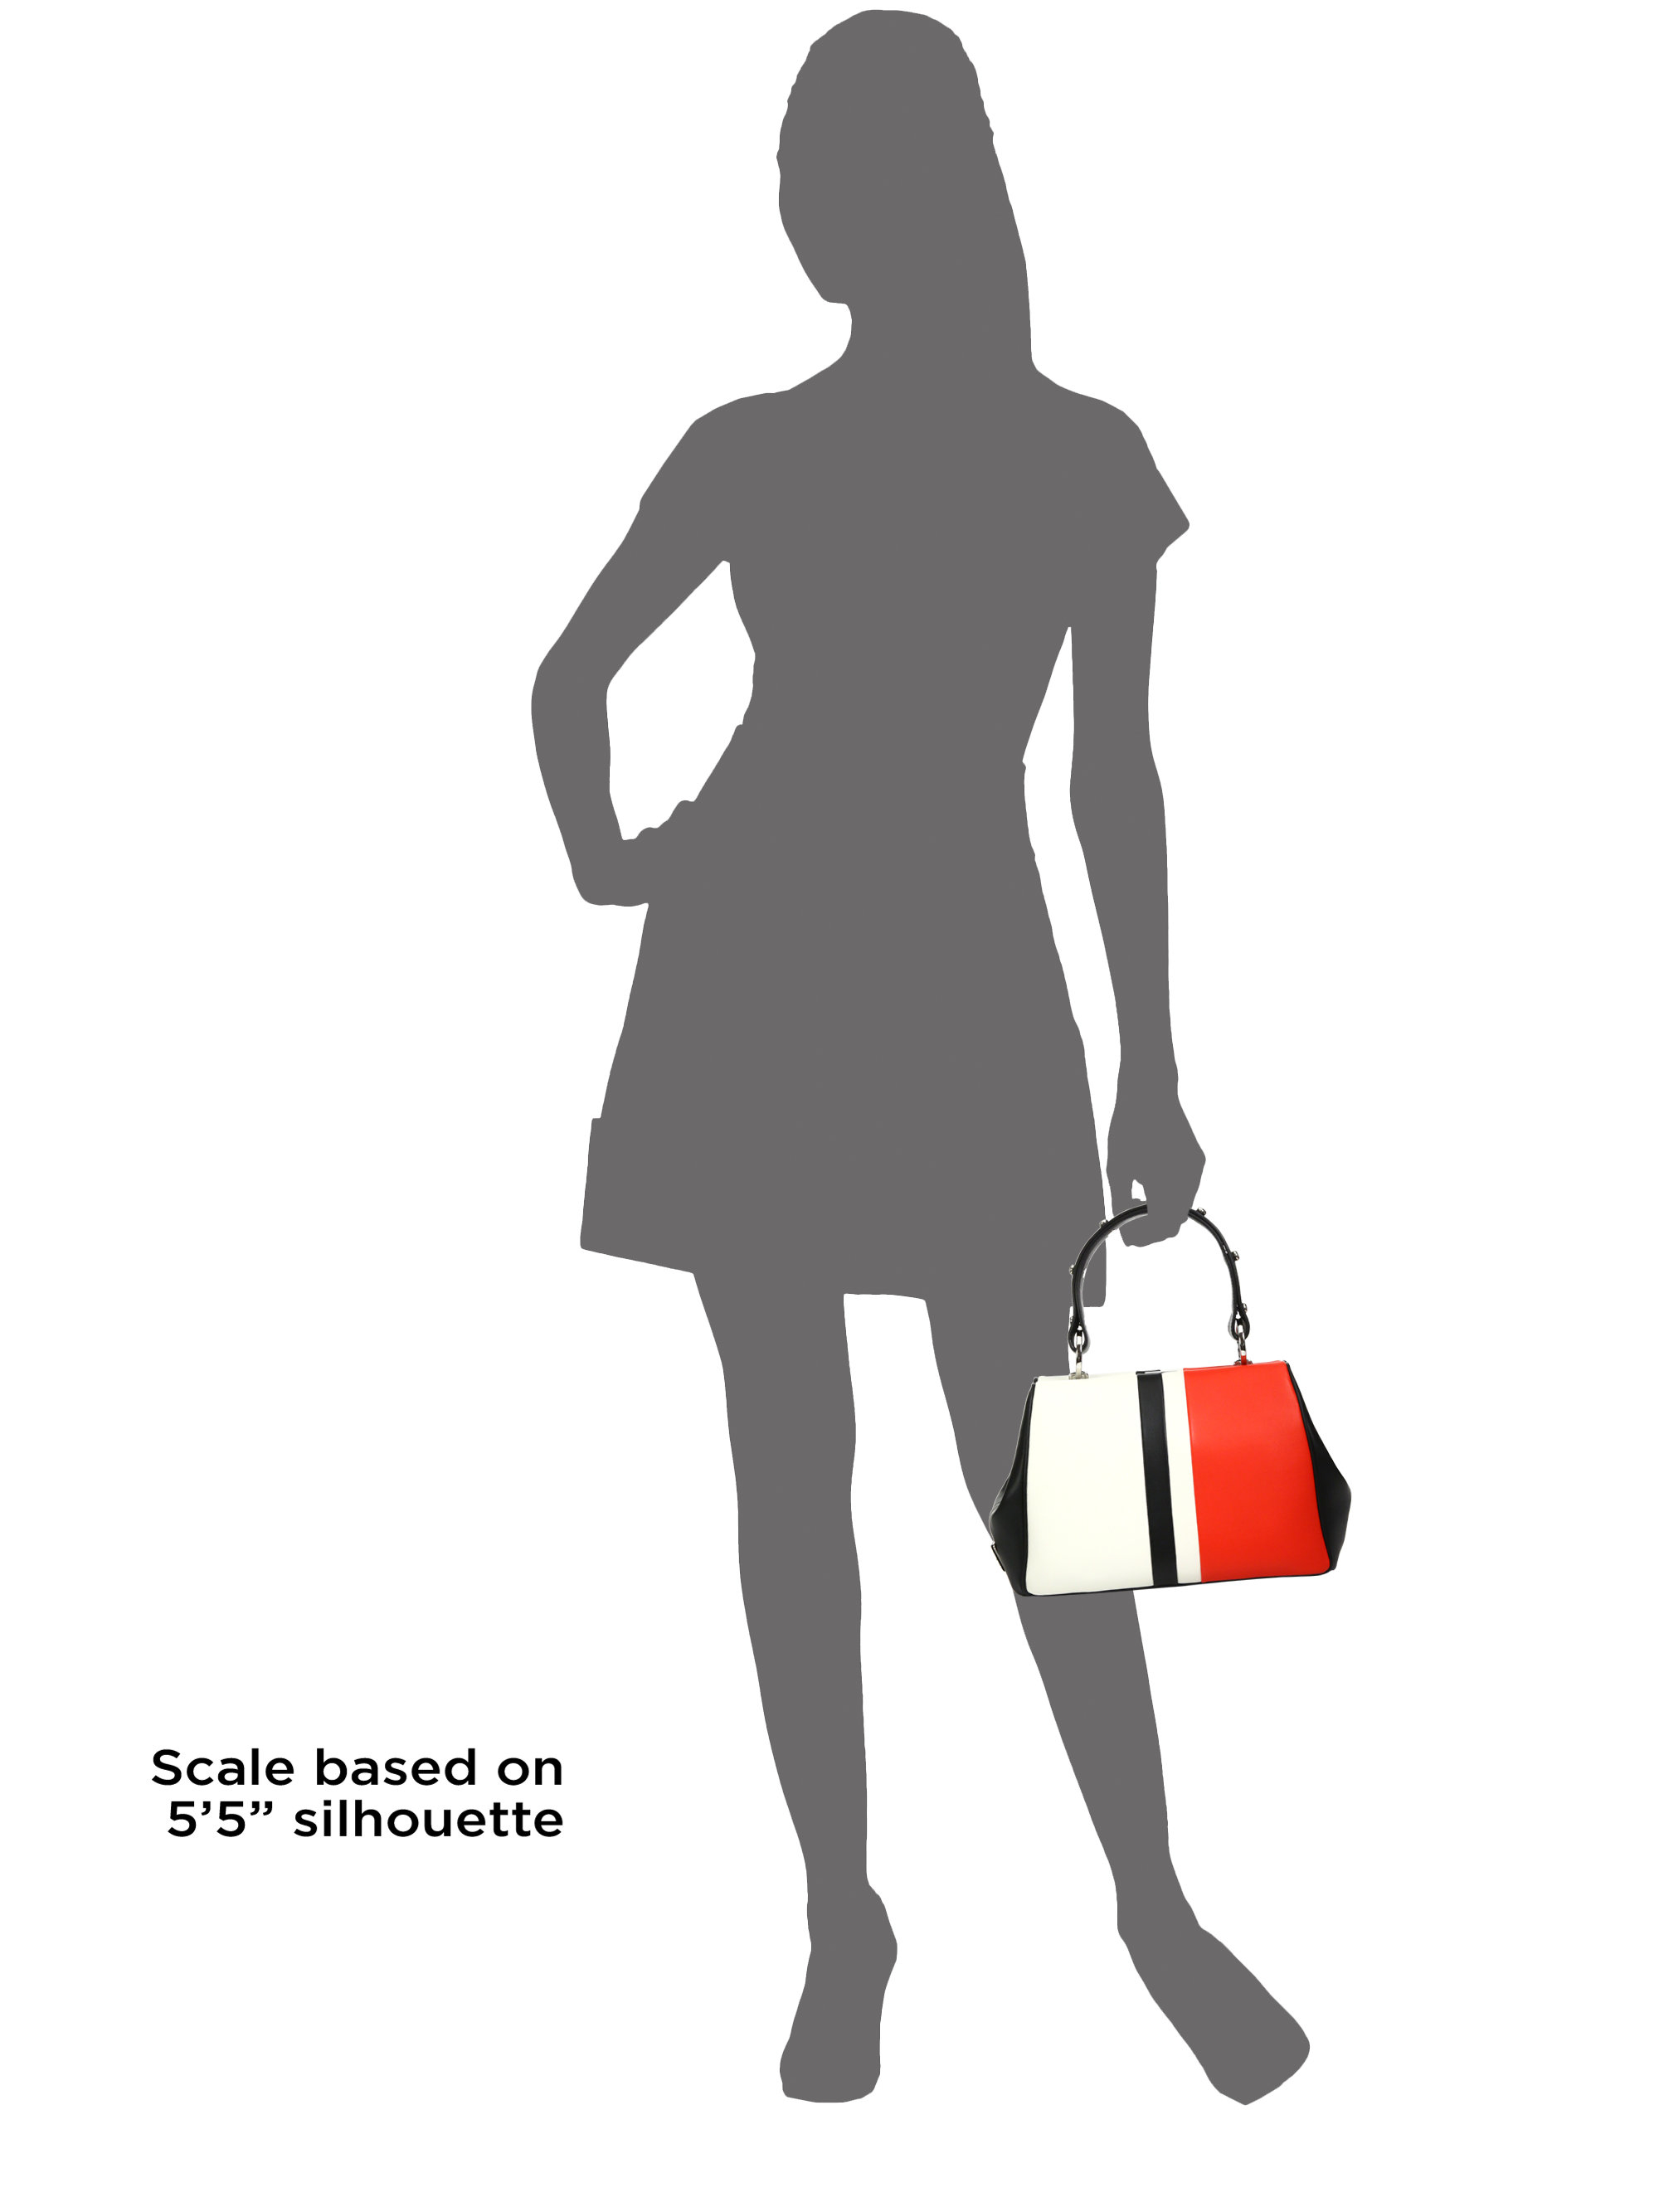 prada galleria bag - Prada Calf Baiadera Small Frame Bag in Black (white-red)   Lyst